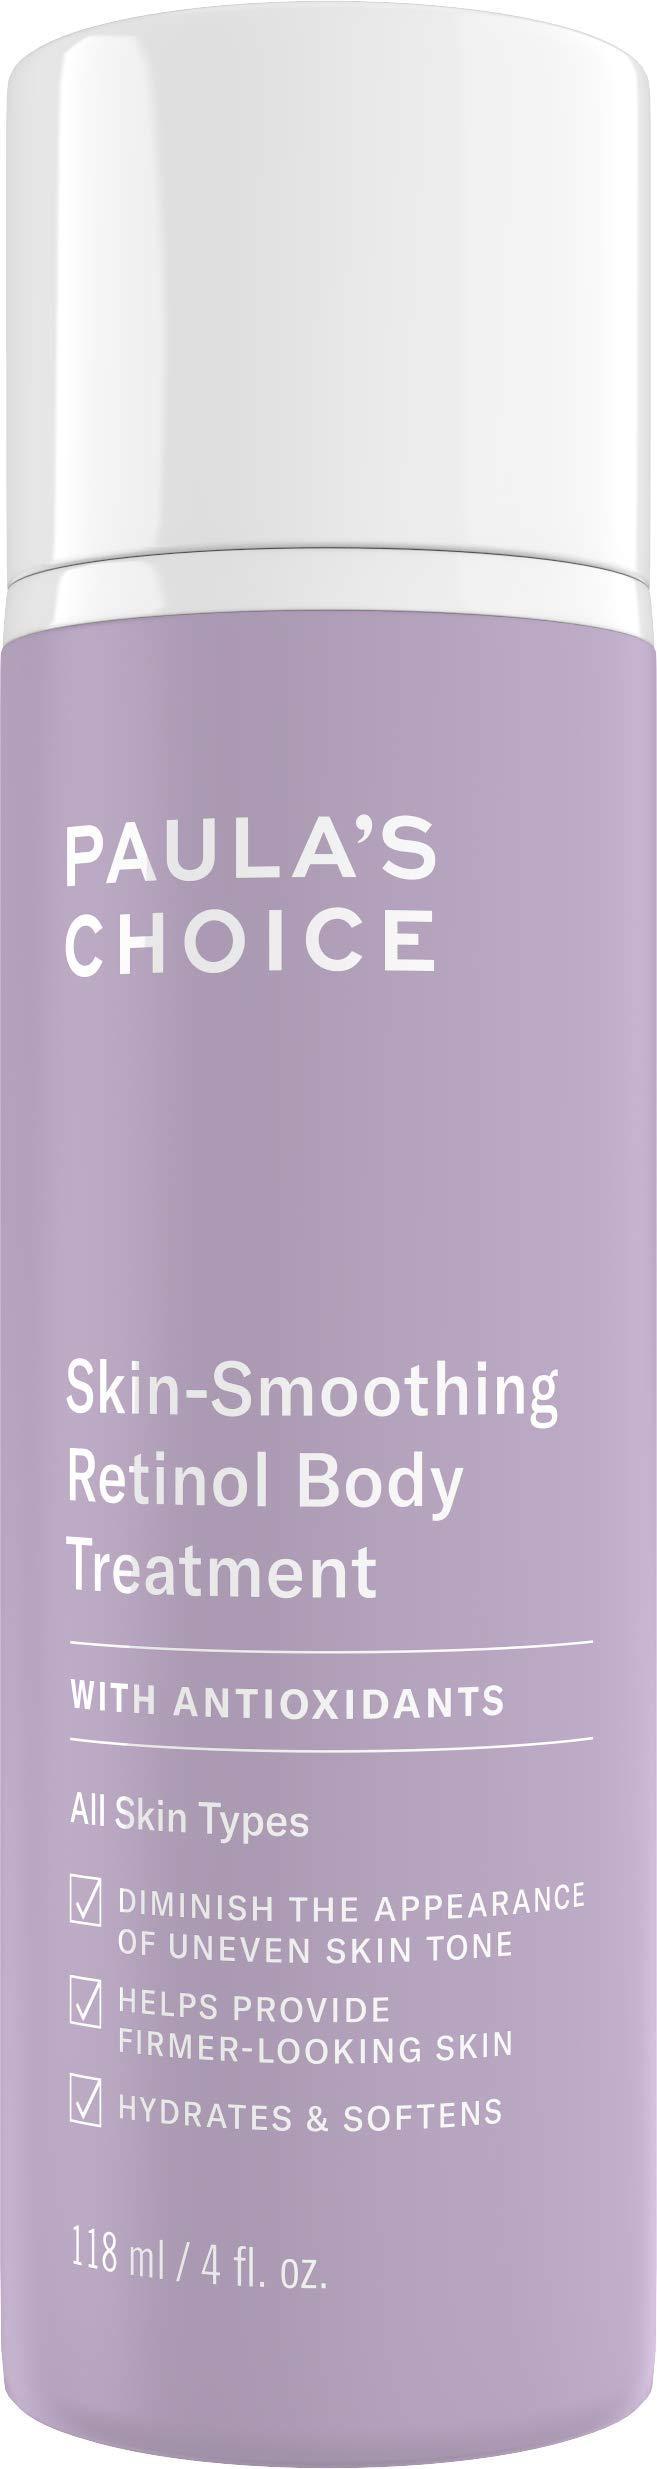 Paula's Choice Retinol Skin-Smoothing Body Treatment, Shea Butter, Vitamin C & E Lotion, Anti-Aging Moisturizer, 4 Ounce by PAULA'S CHOICE